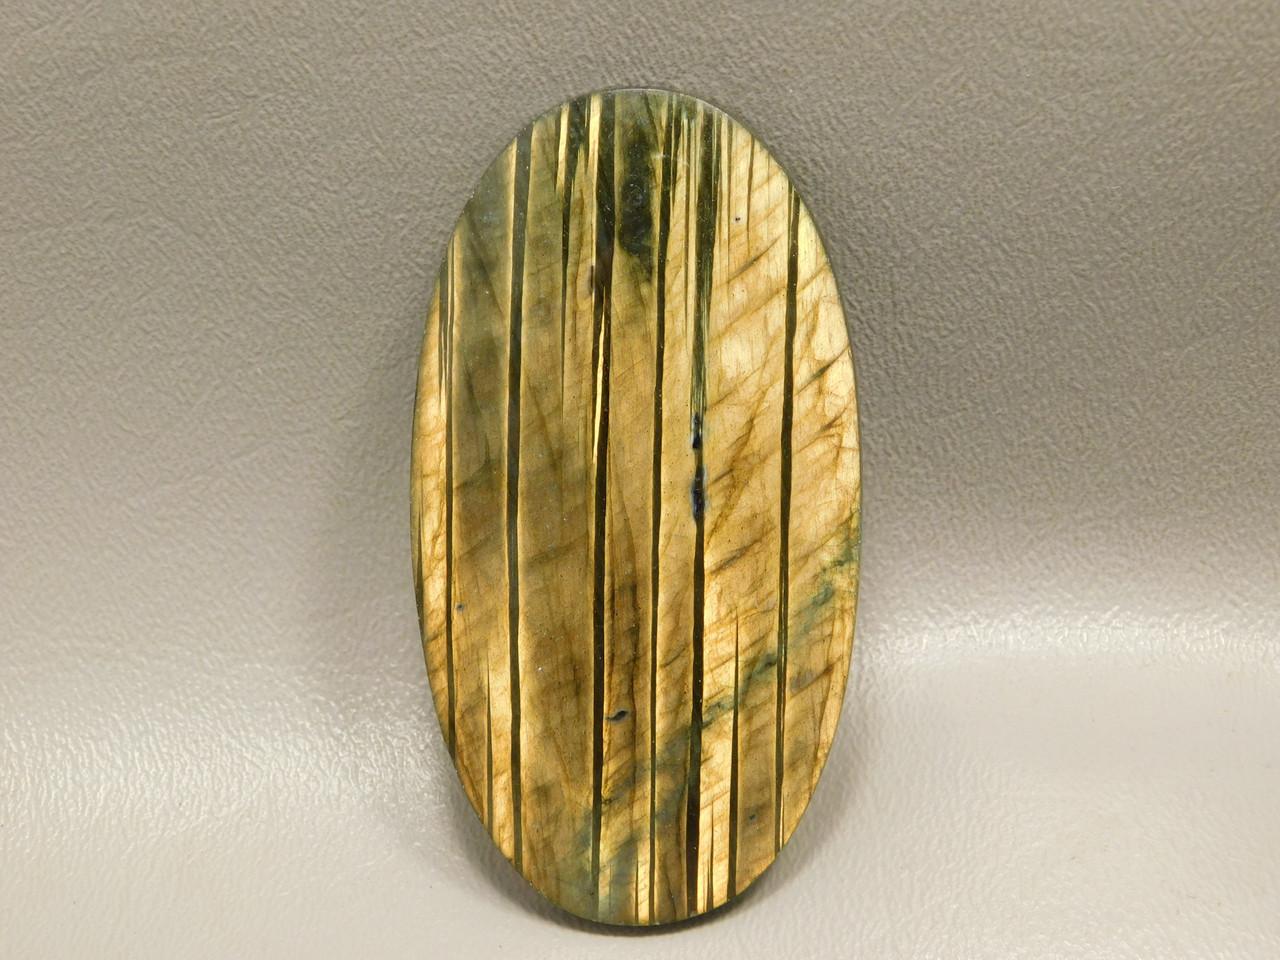 Labradorite Large Collector Cabochon Jewelry Stone #XL3